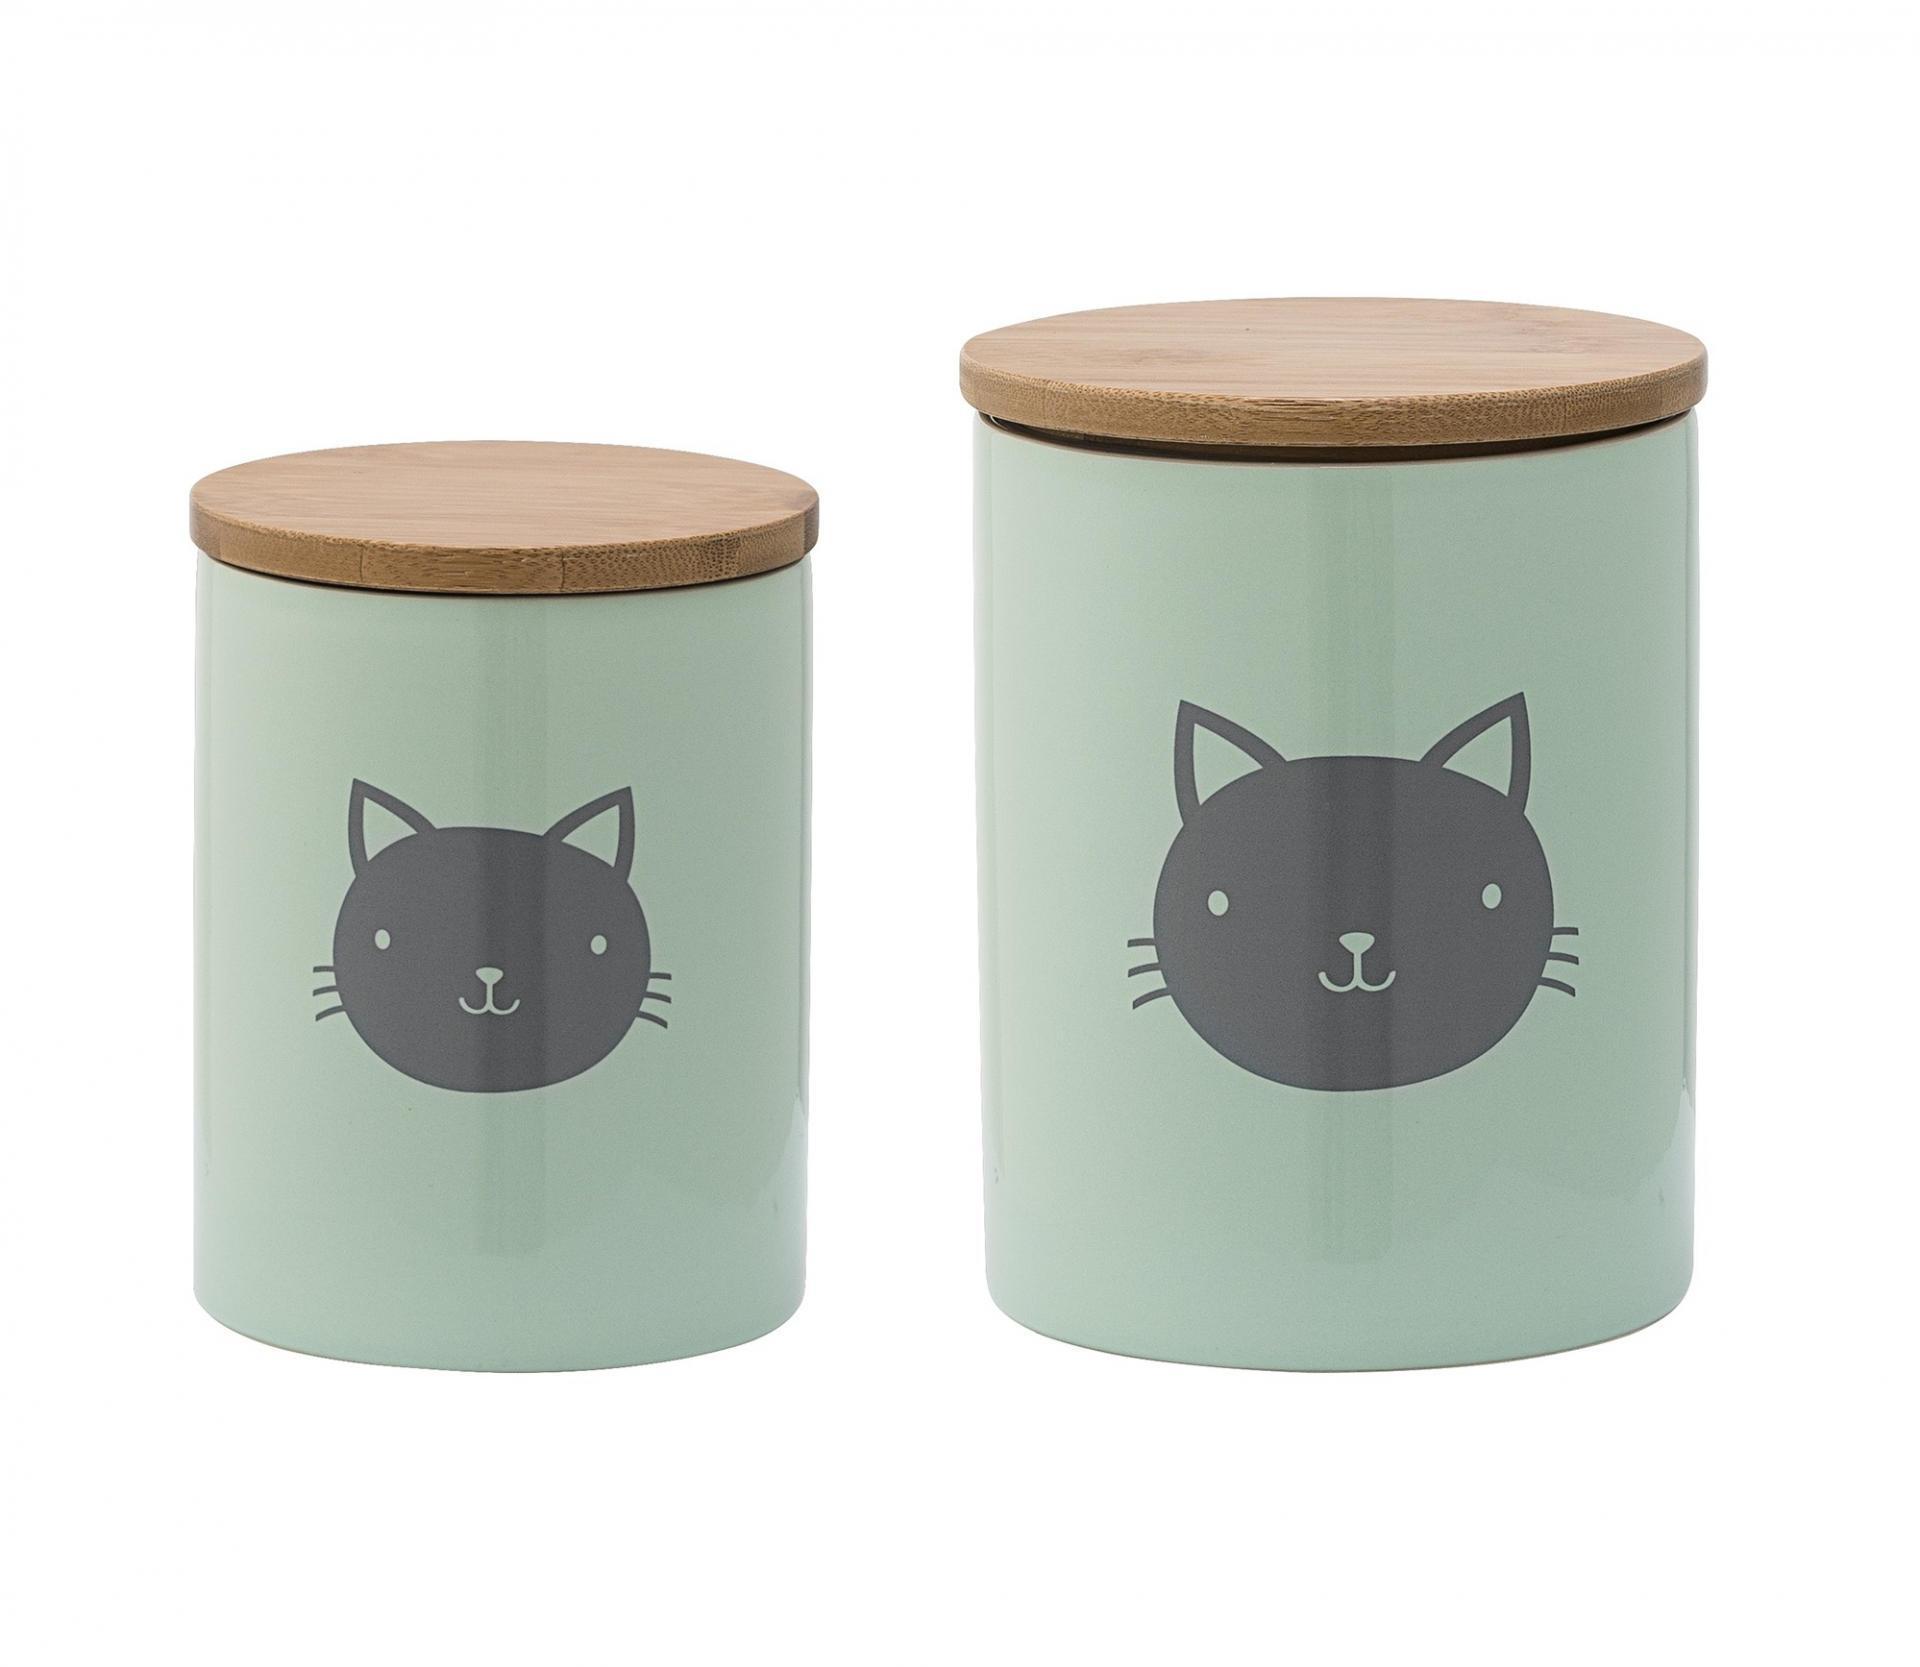 Bloomingville Keramická dóza na granule Cat Dusty mint Menší, zelená barva, keramika